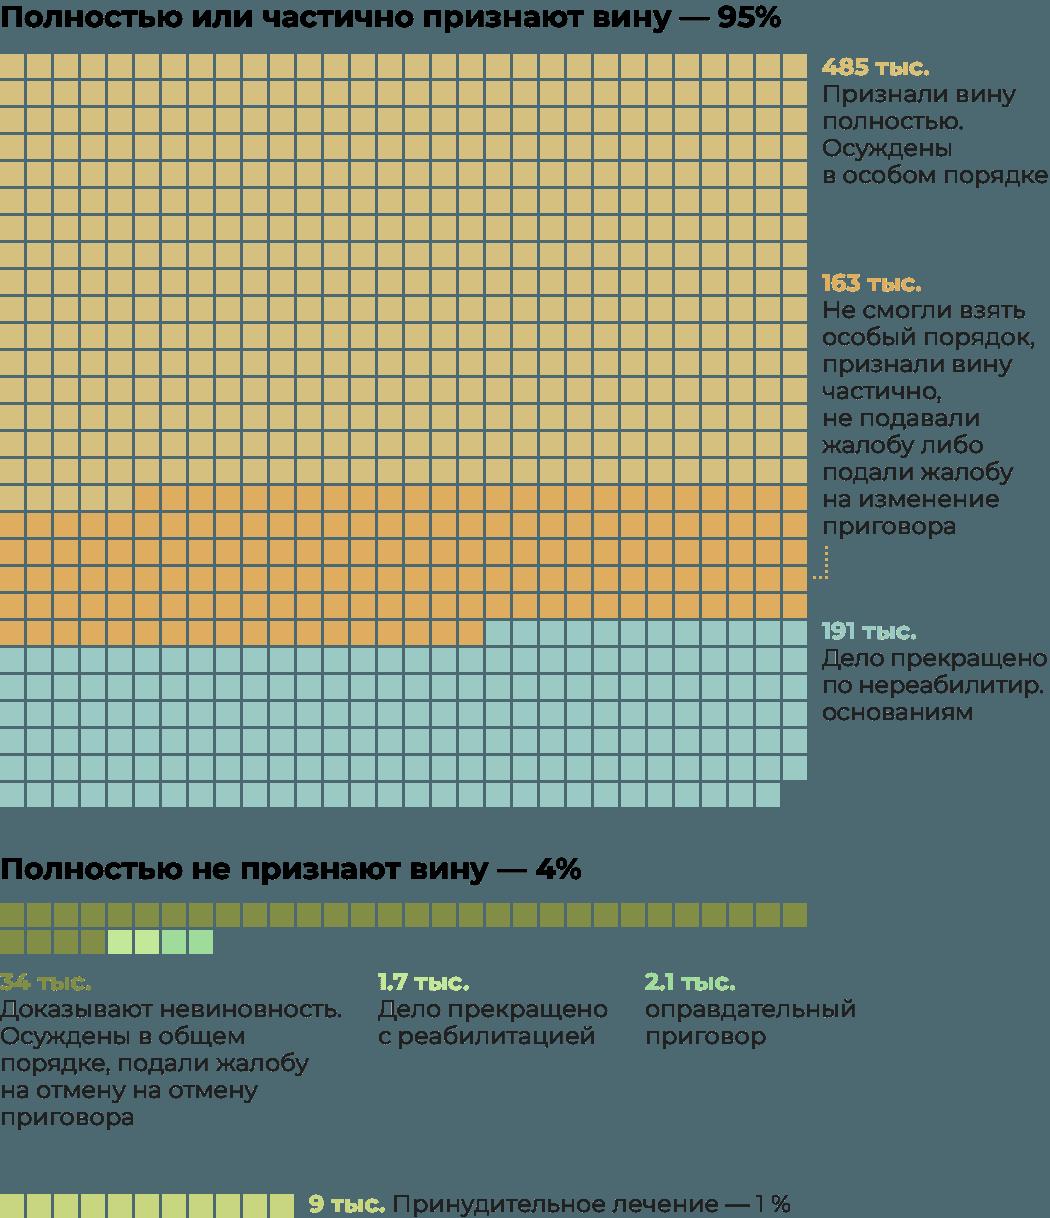 Сокращение работника за месяц до пенсии в республике